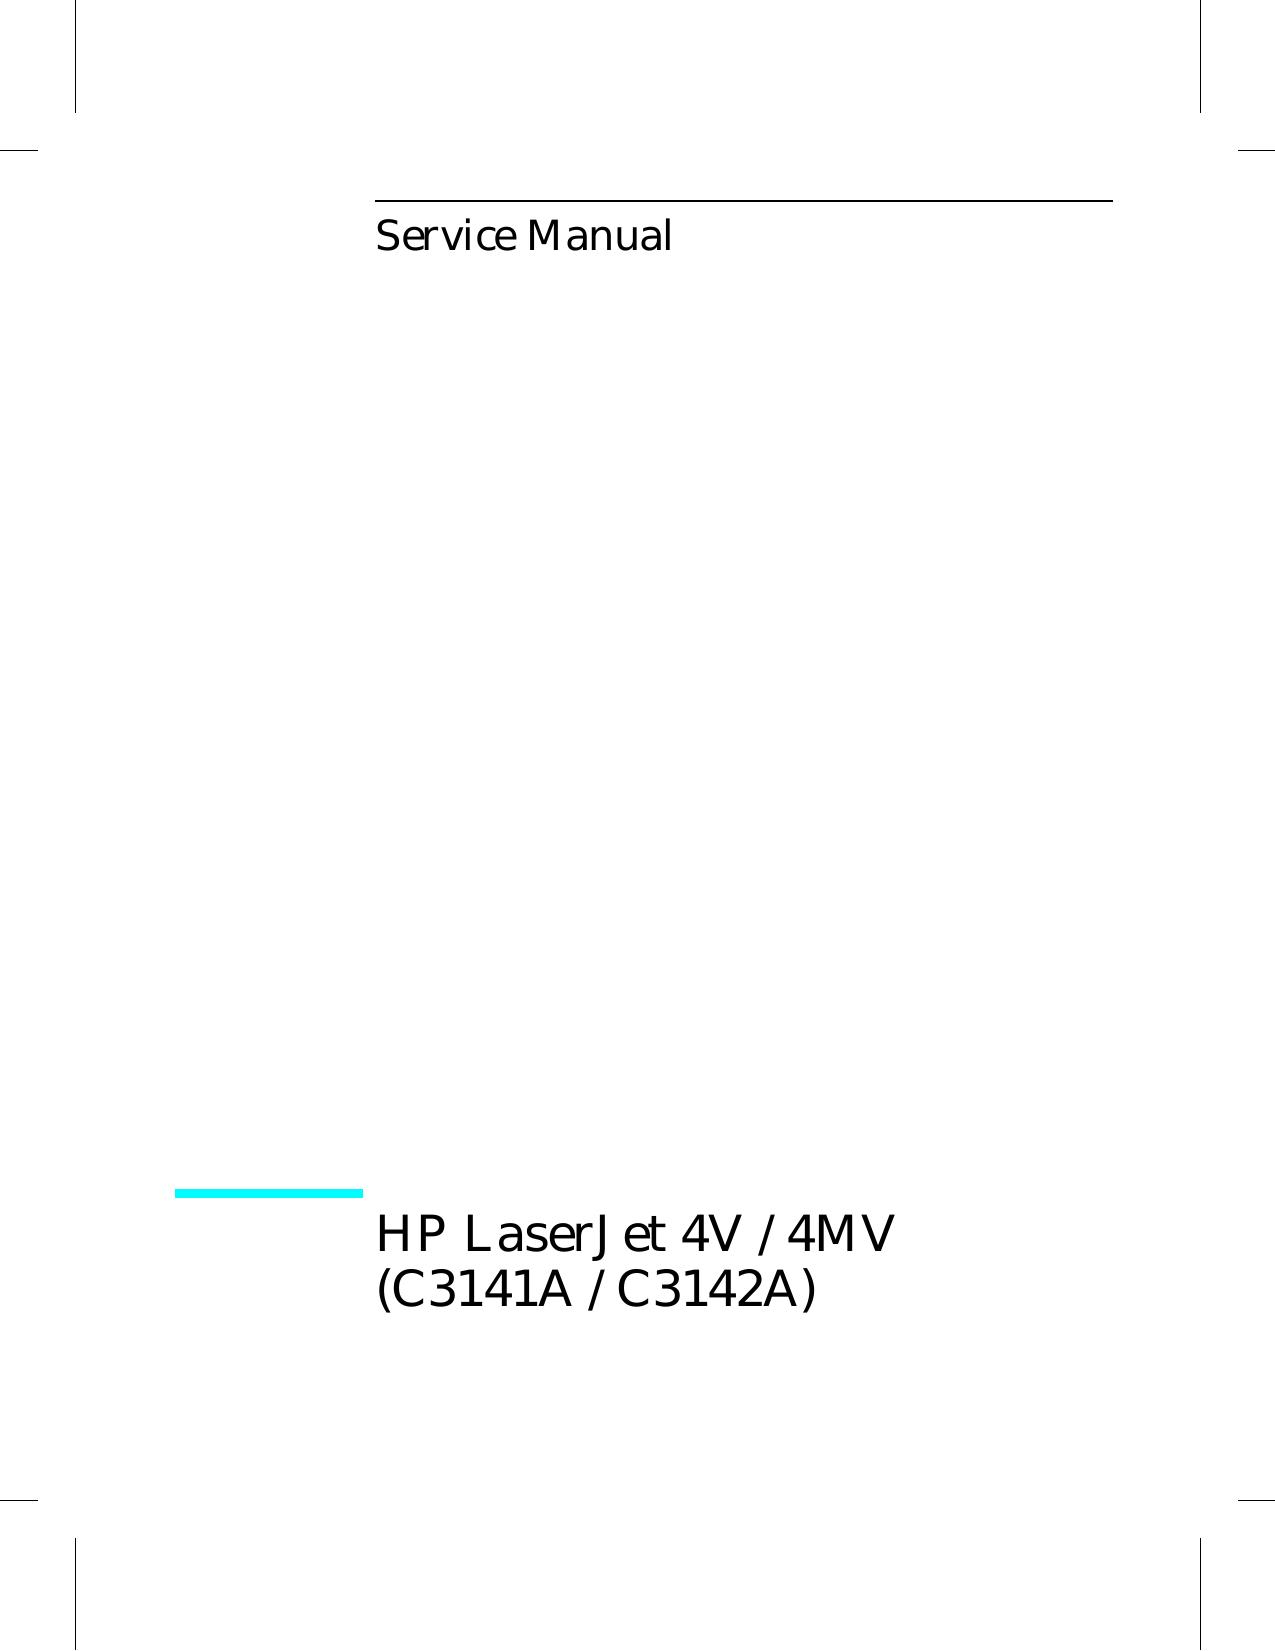 HP C3141A WINDOWS DRIVER